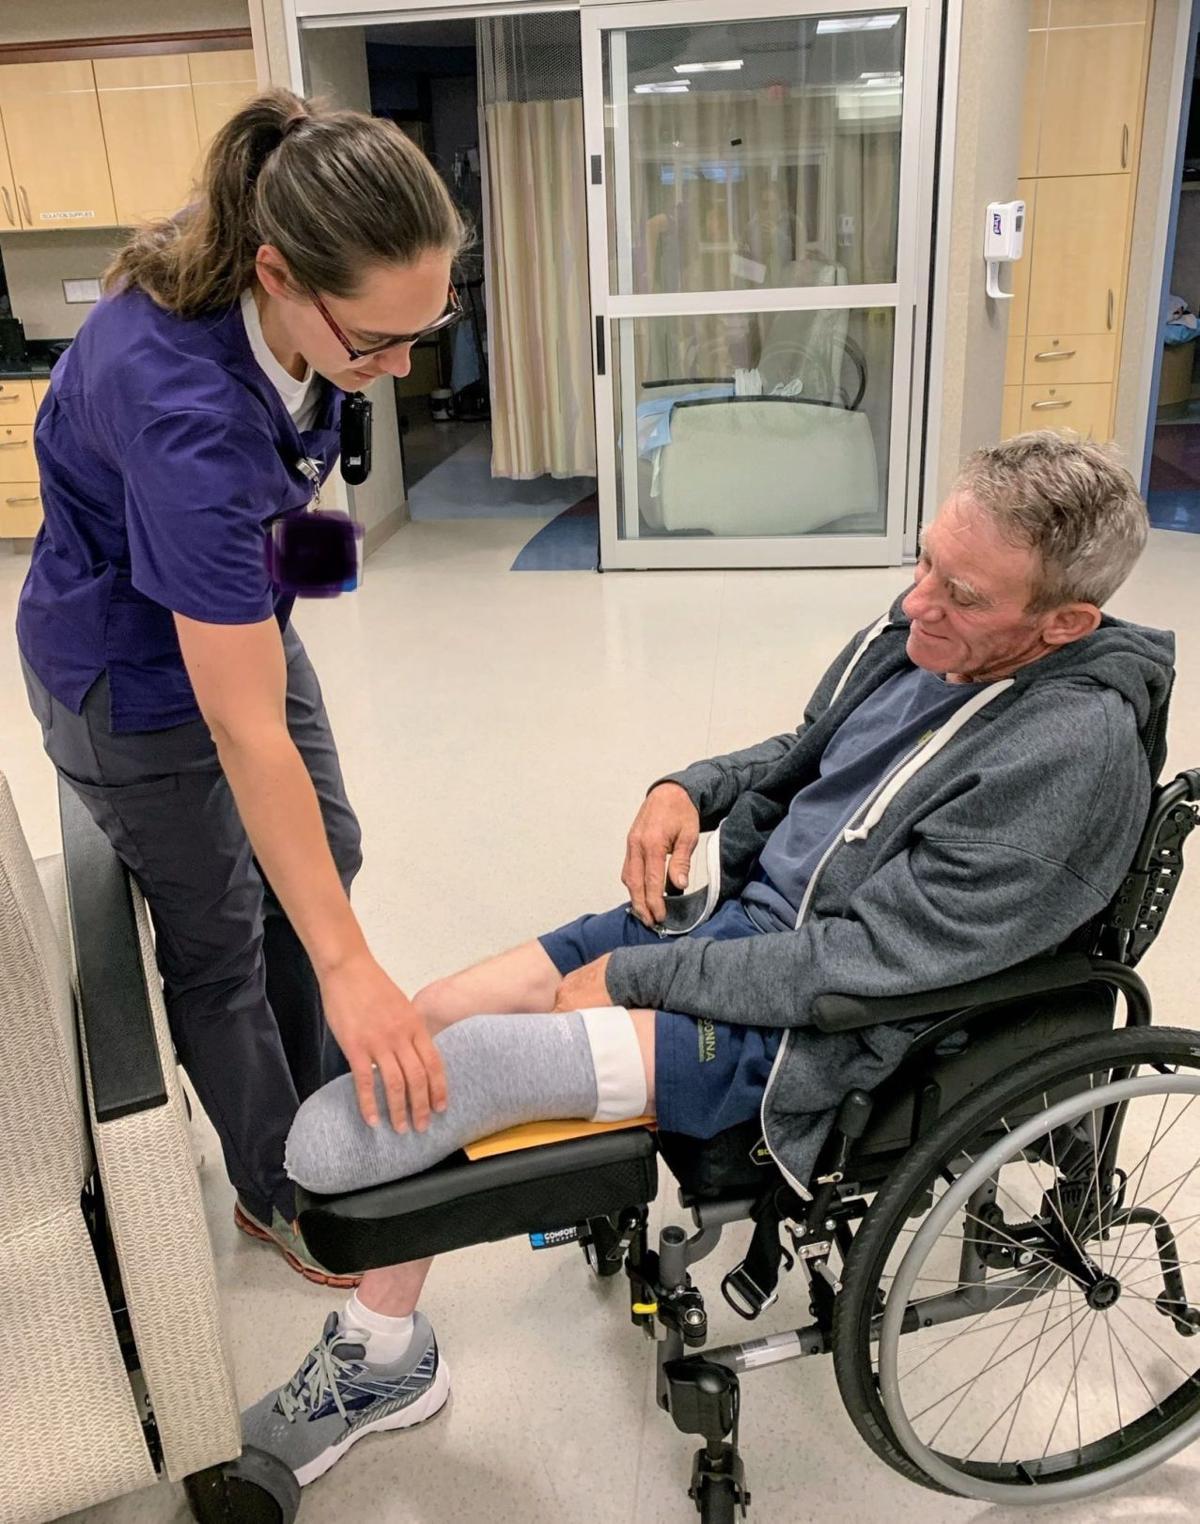 Farmer amputates his leg